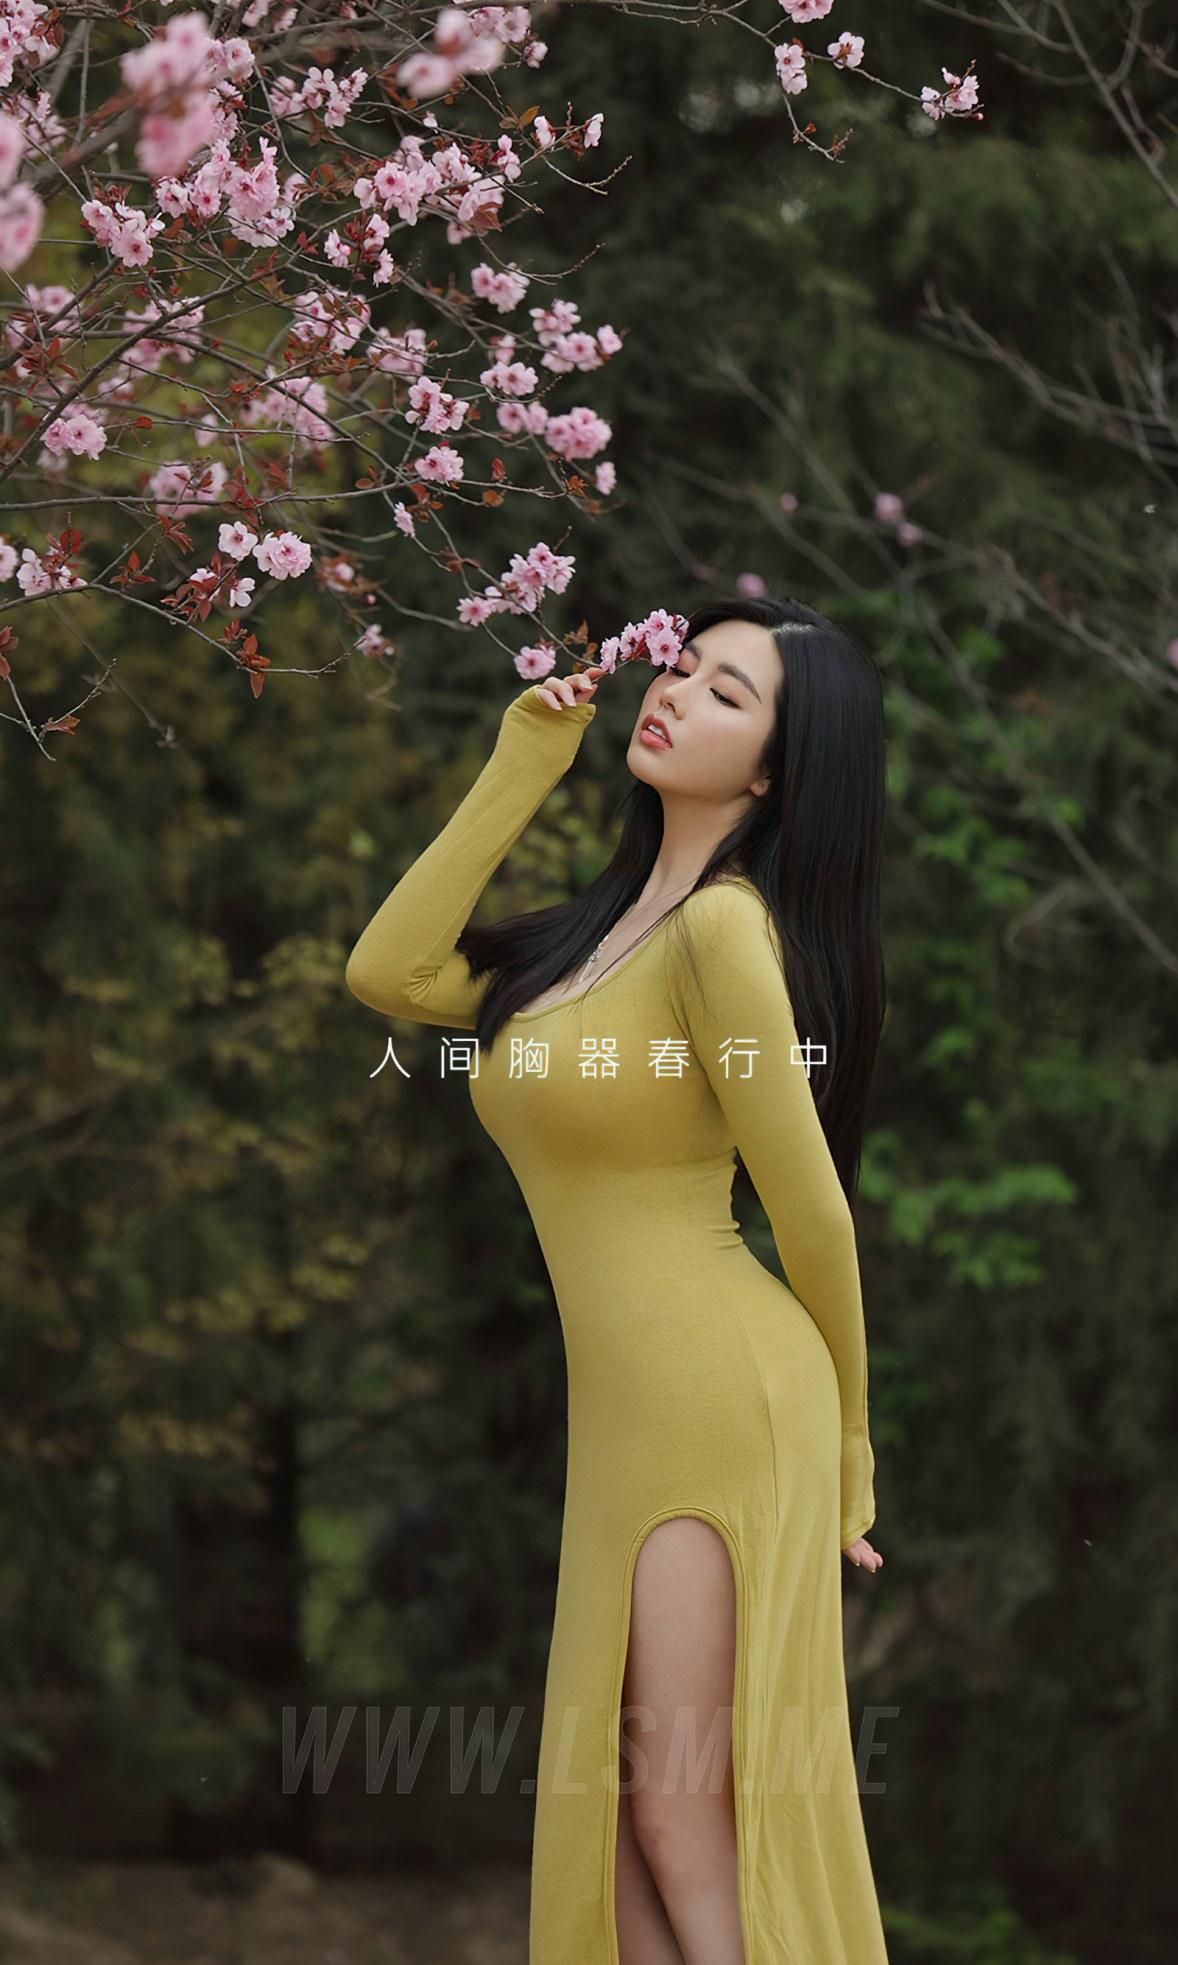 UGirls 爱尤物 No.2074 娜露 赏春 - 2